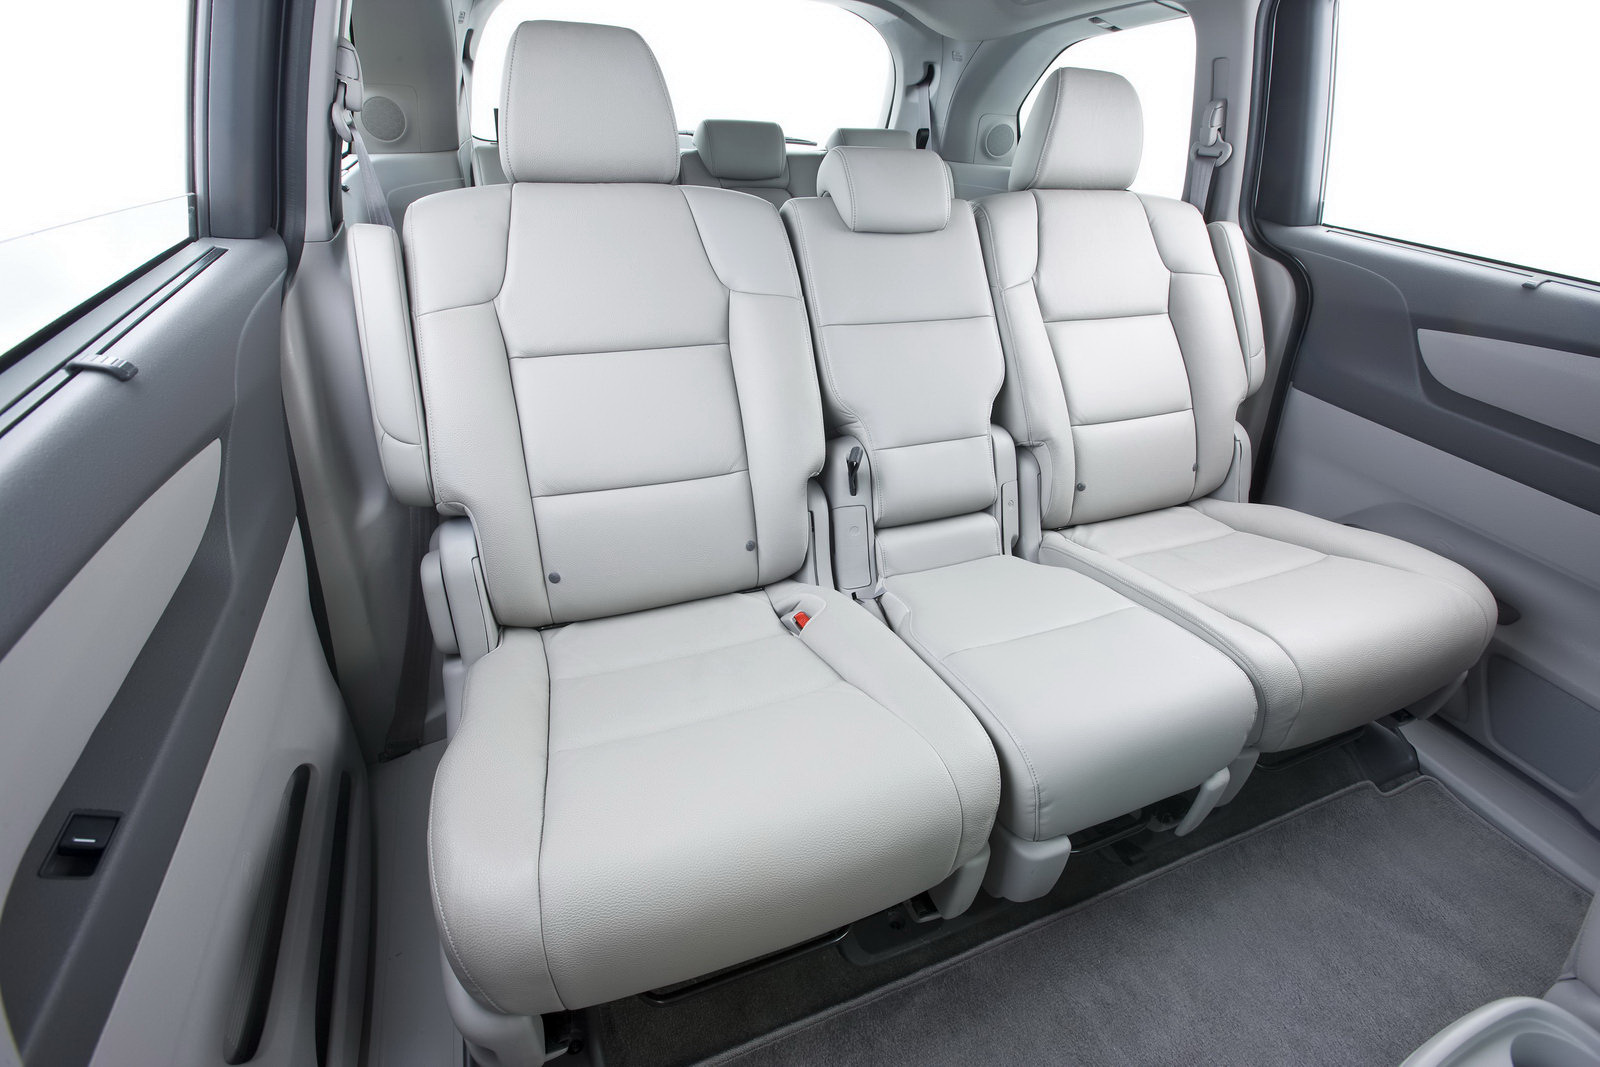 2011 honda odyssey minivan officially revealed 45 photos for Honda odyssey magic seat